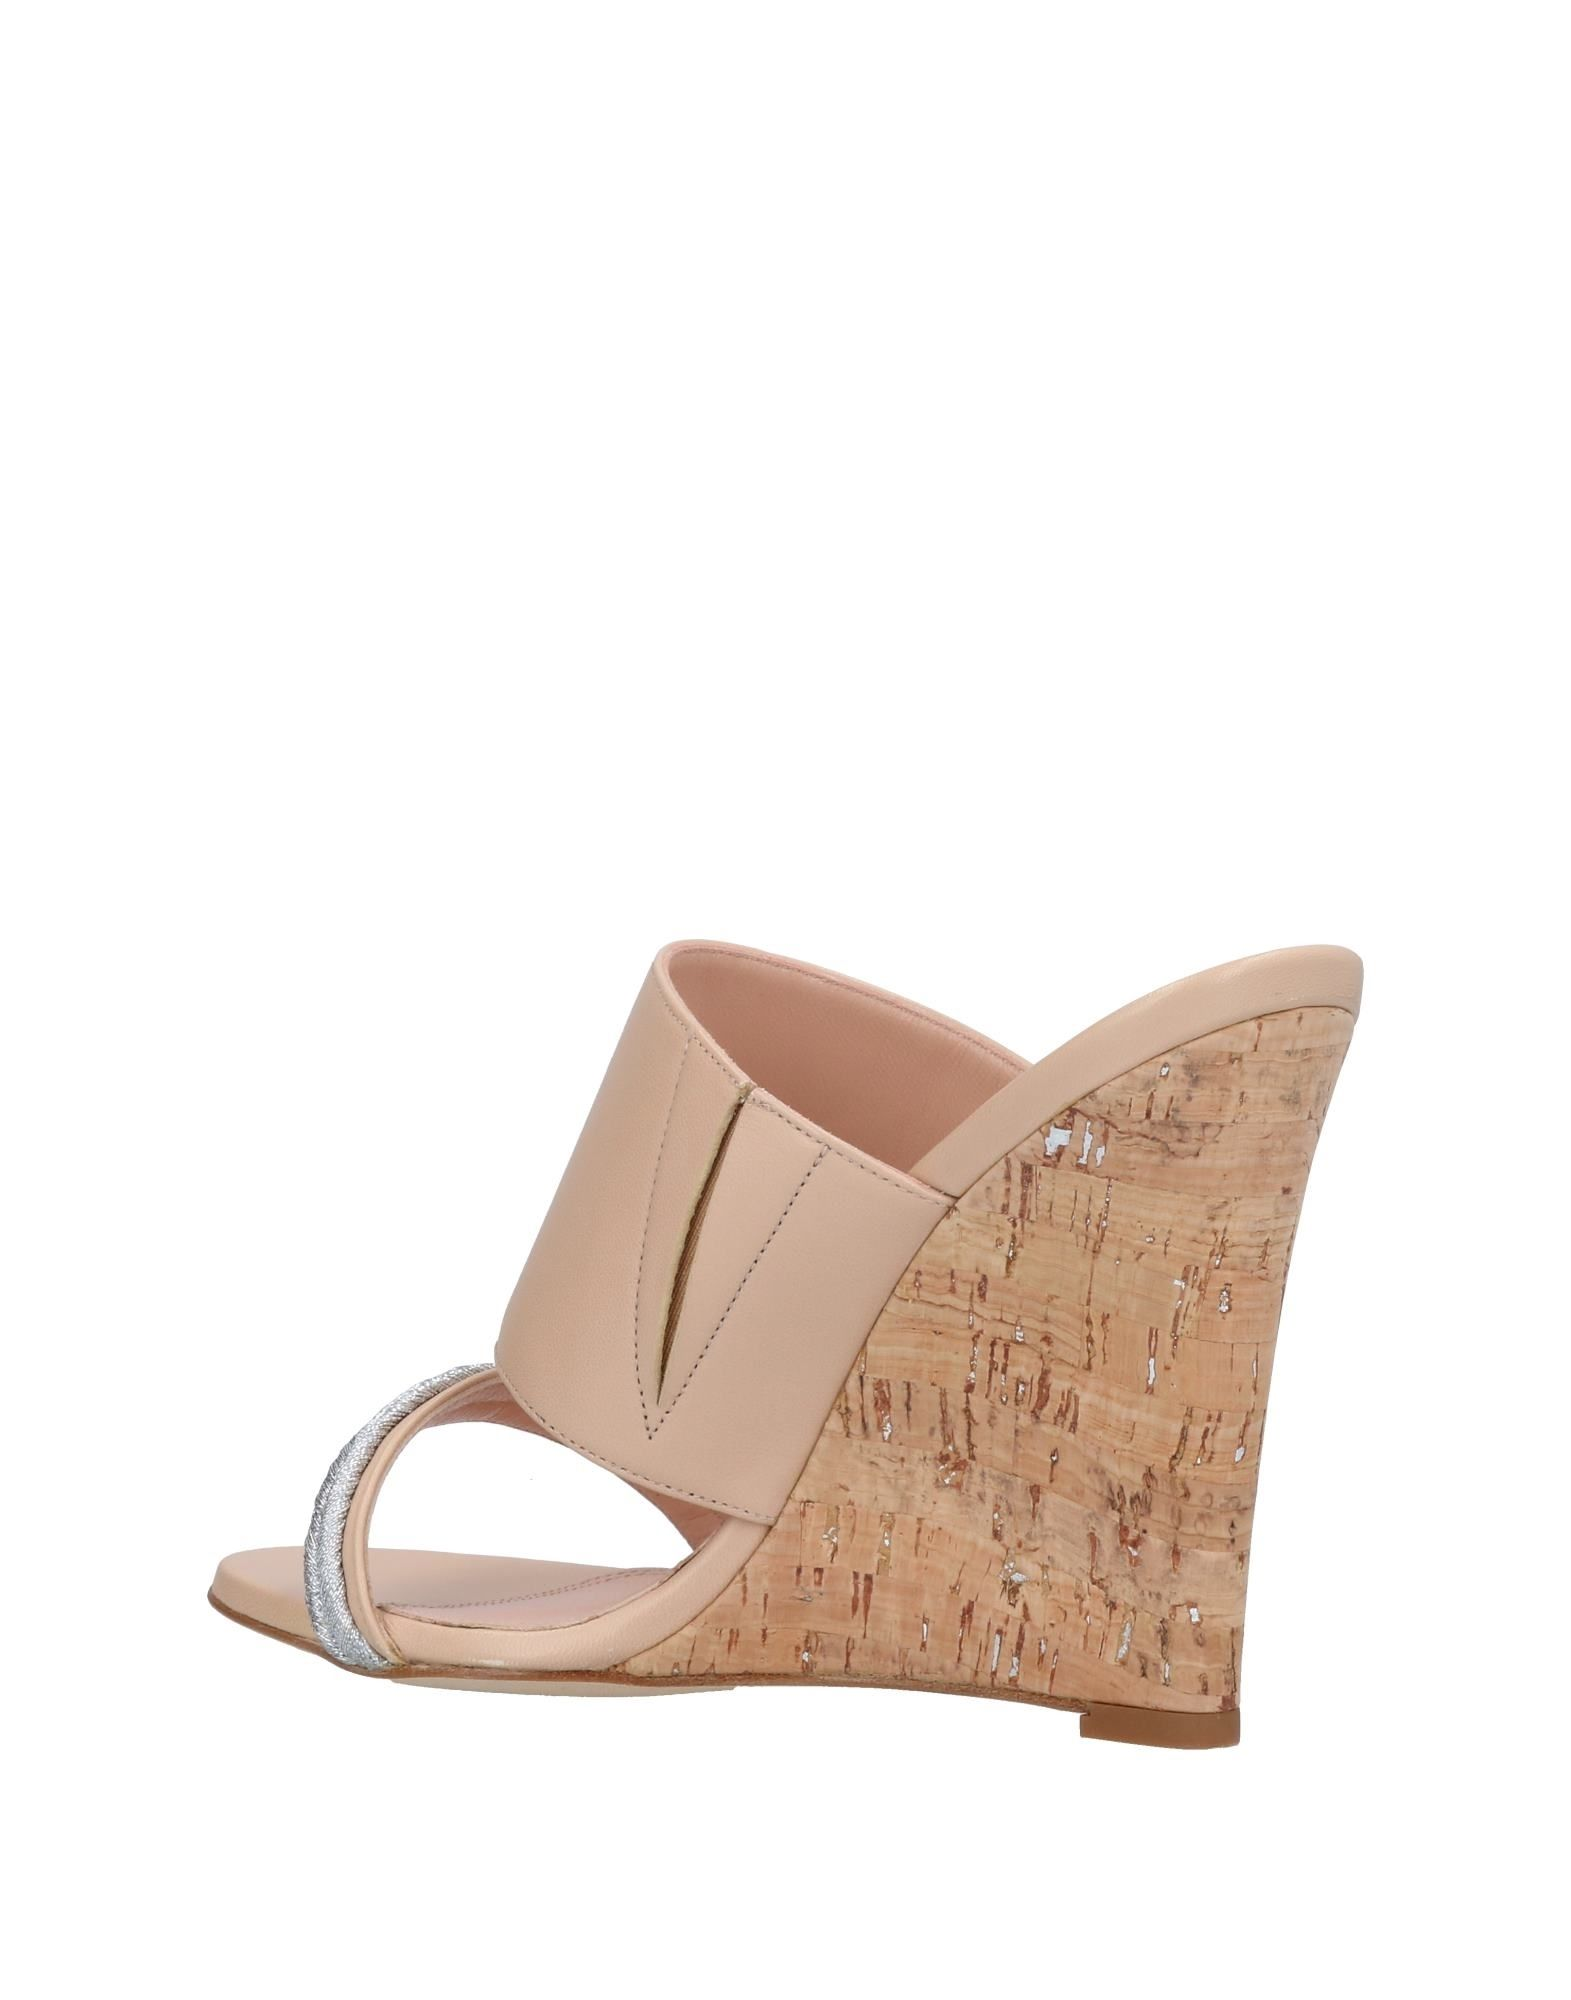 Lamperti Damen Milano Sandalen Damen Lamperti  11415099RI Neue Schuhe 8c4fac